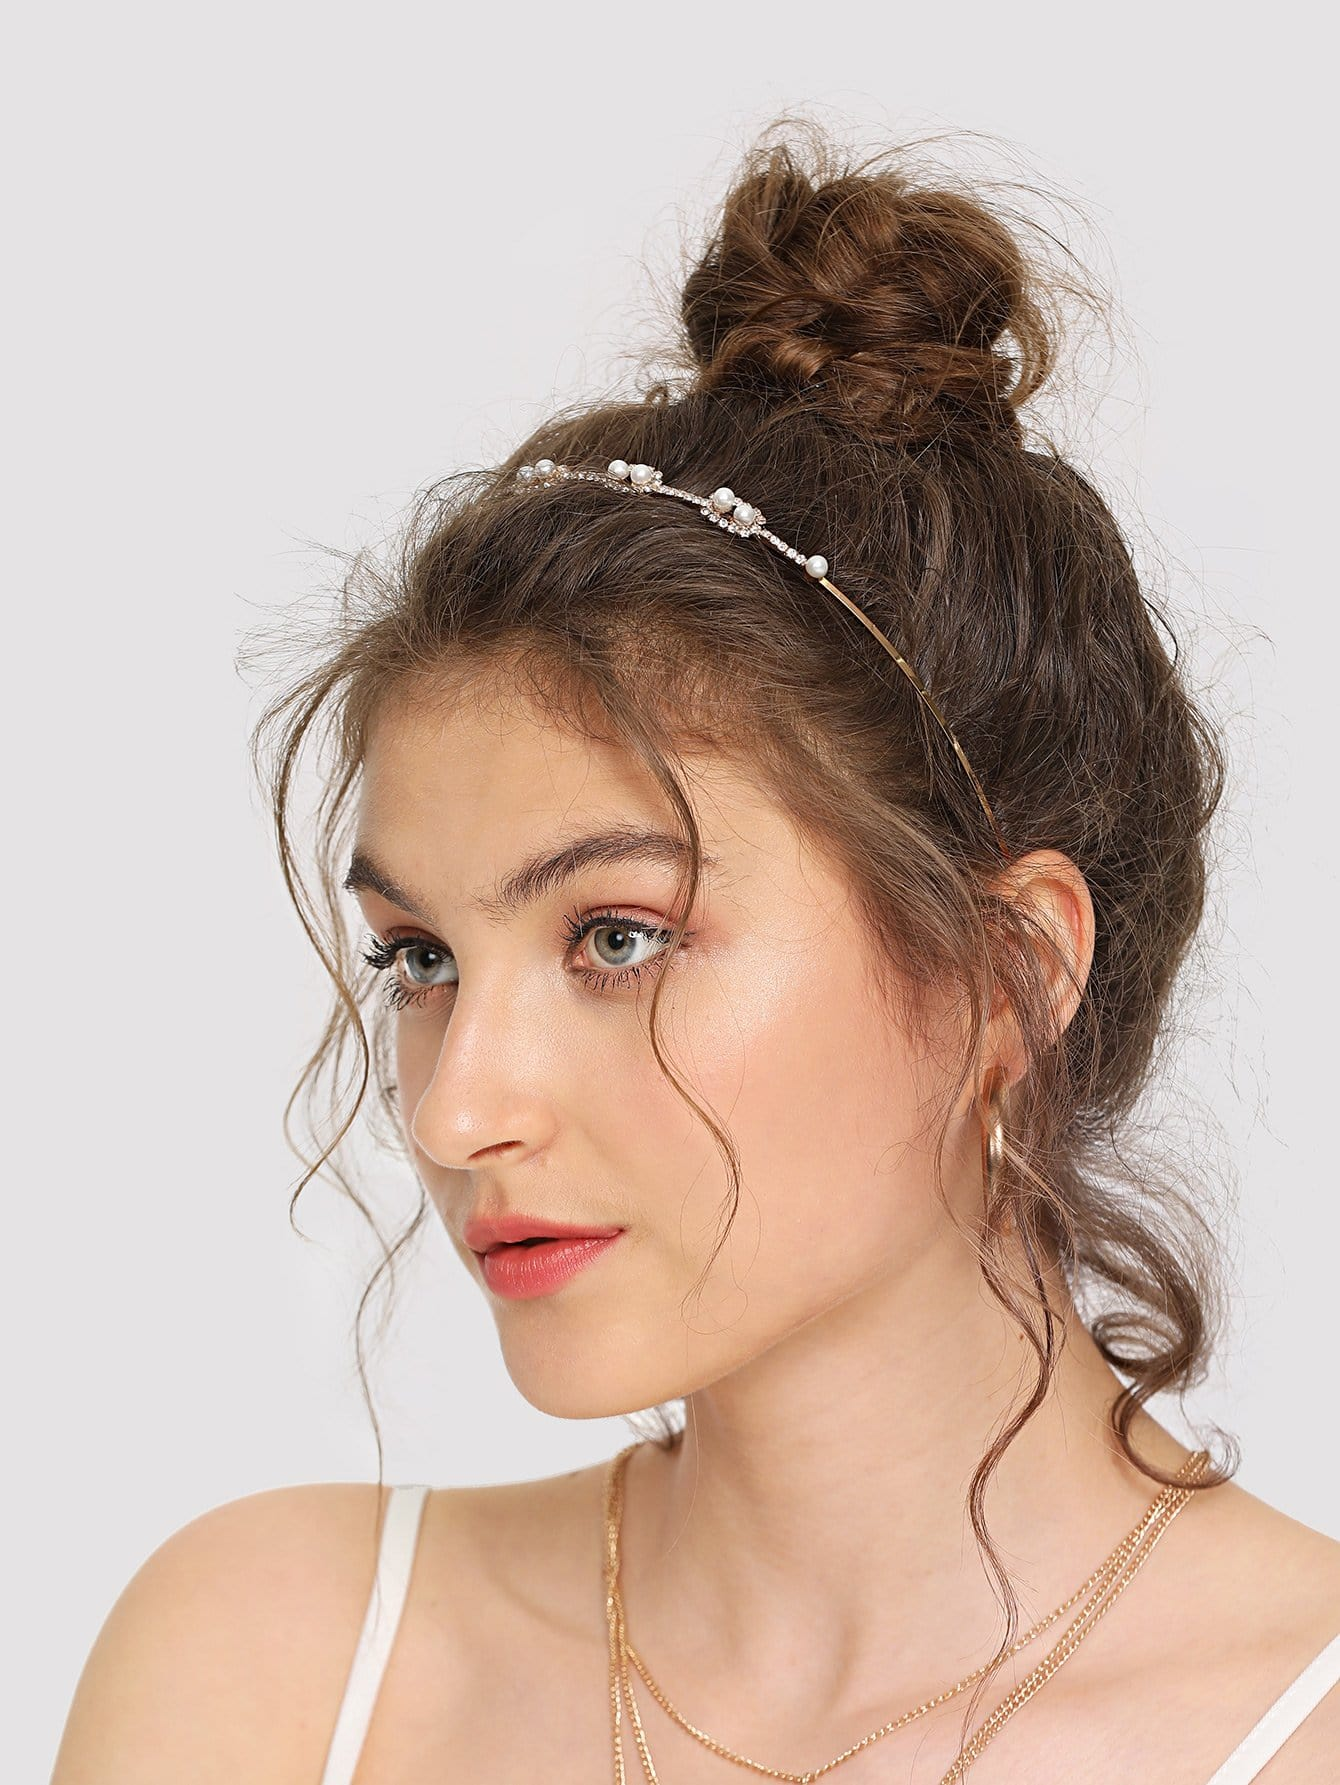 Rhinestones & Faux Pearl Design Headband halloween women cat ears faux rhinestones alloy headband hairbands girls hair head bands cute headband headwear accessories